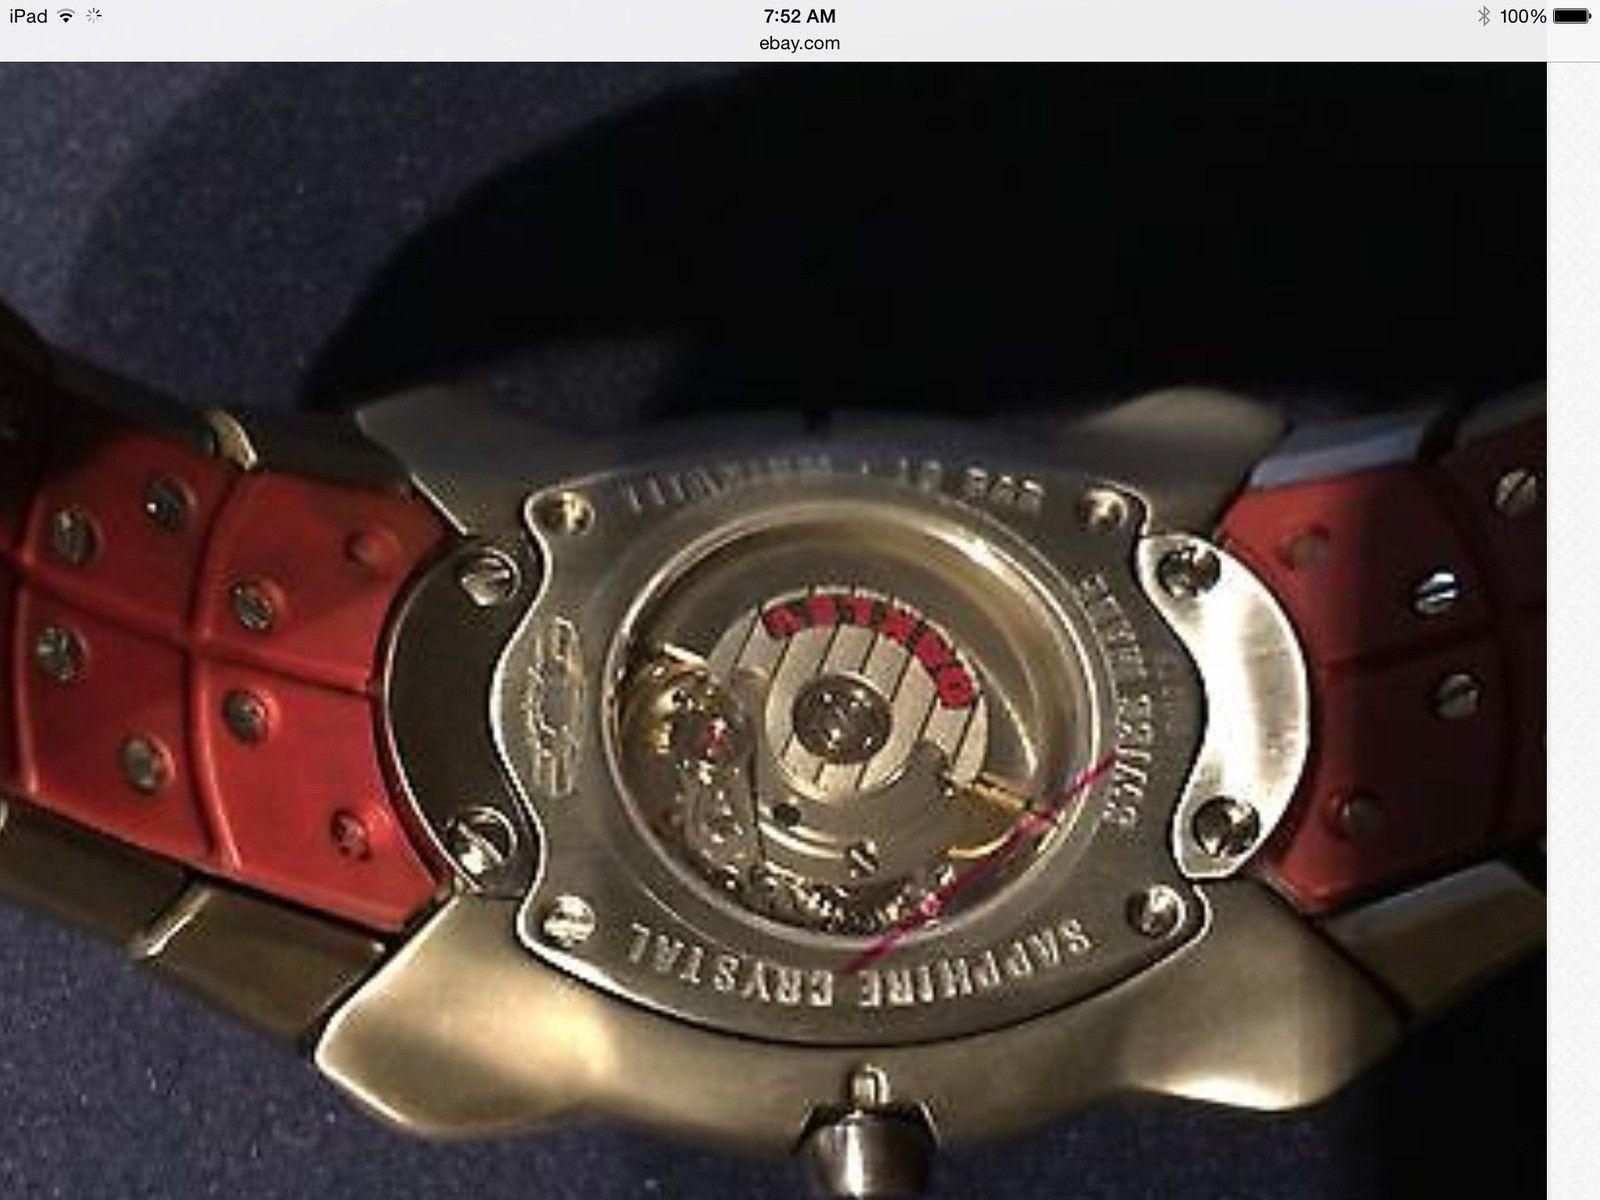 Fake Time Bomb II on eBay? - image.jpg